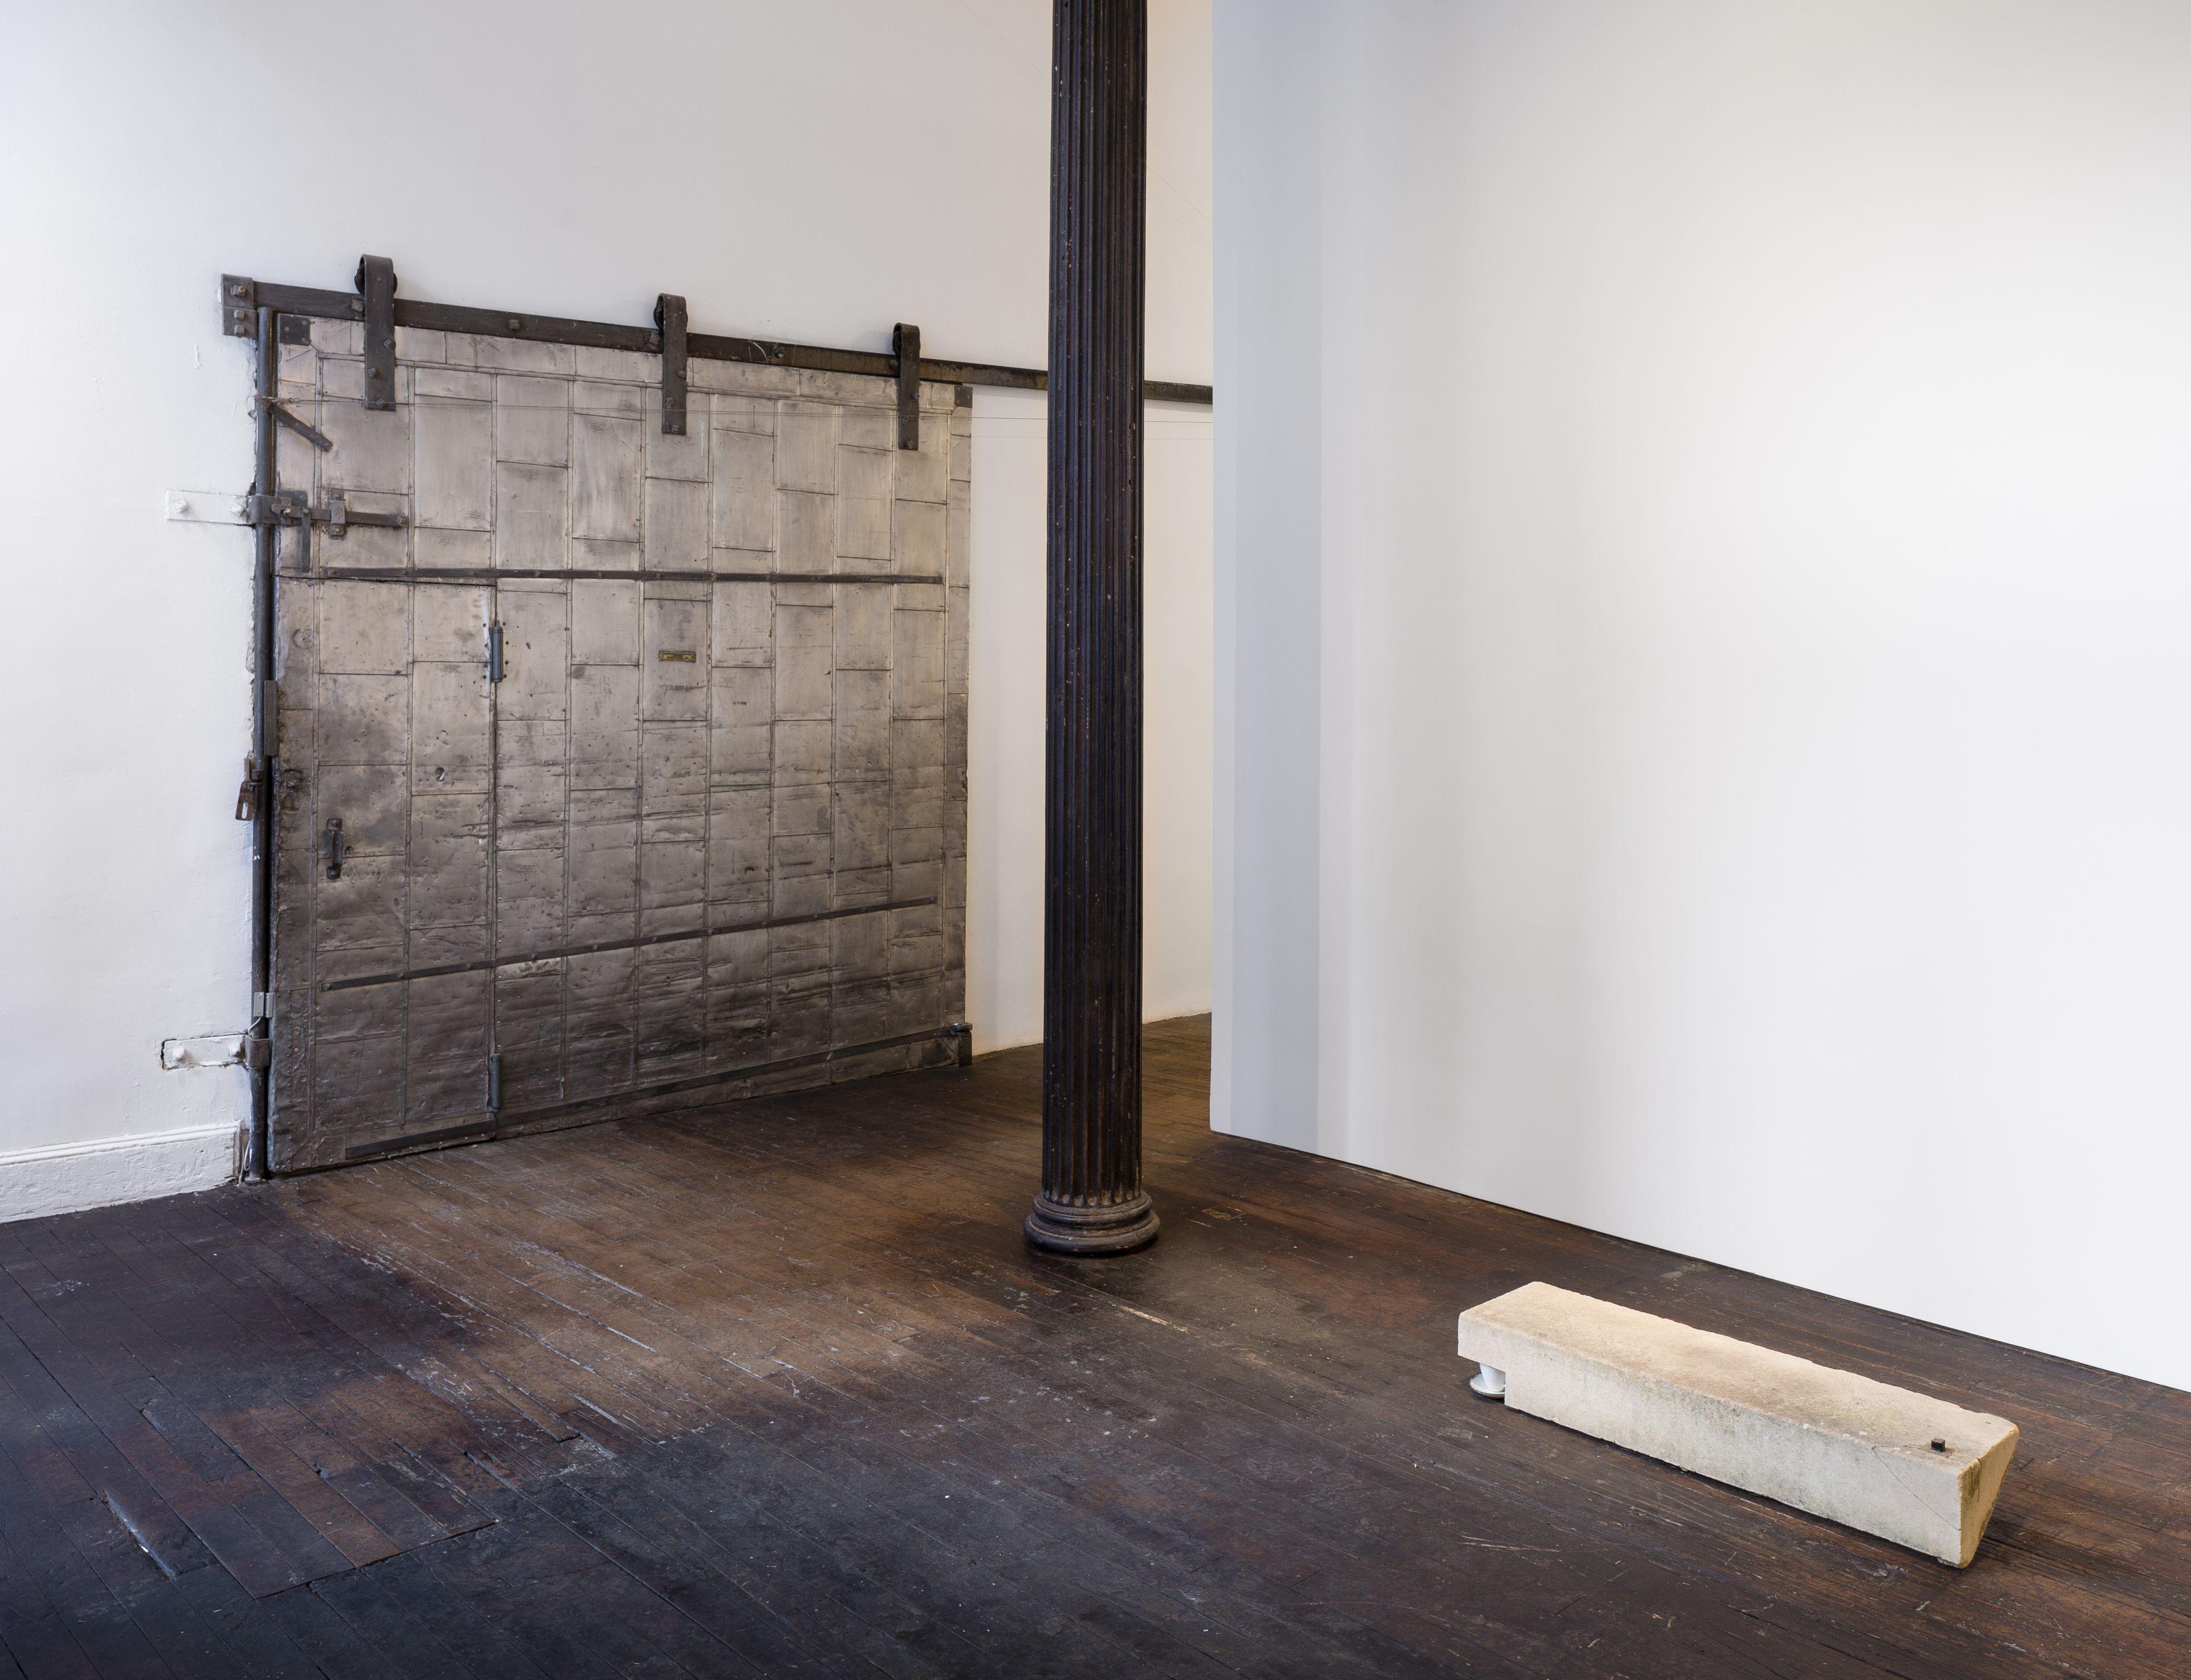 Lucy Skaer: Random House – installation view 1